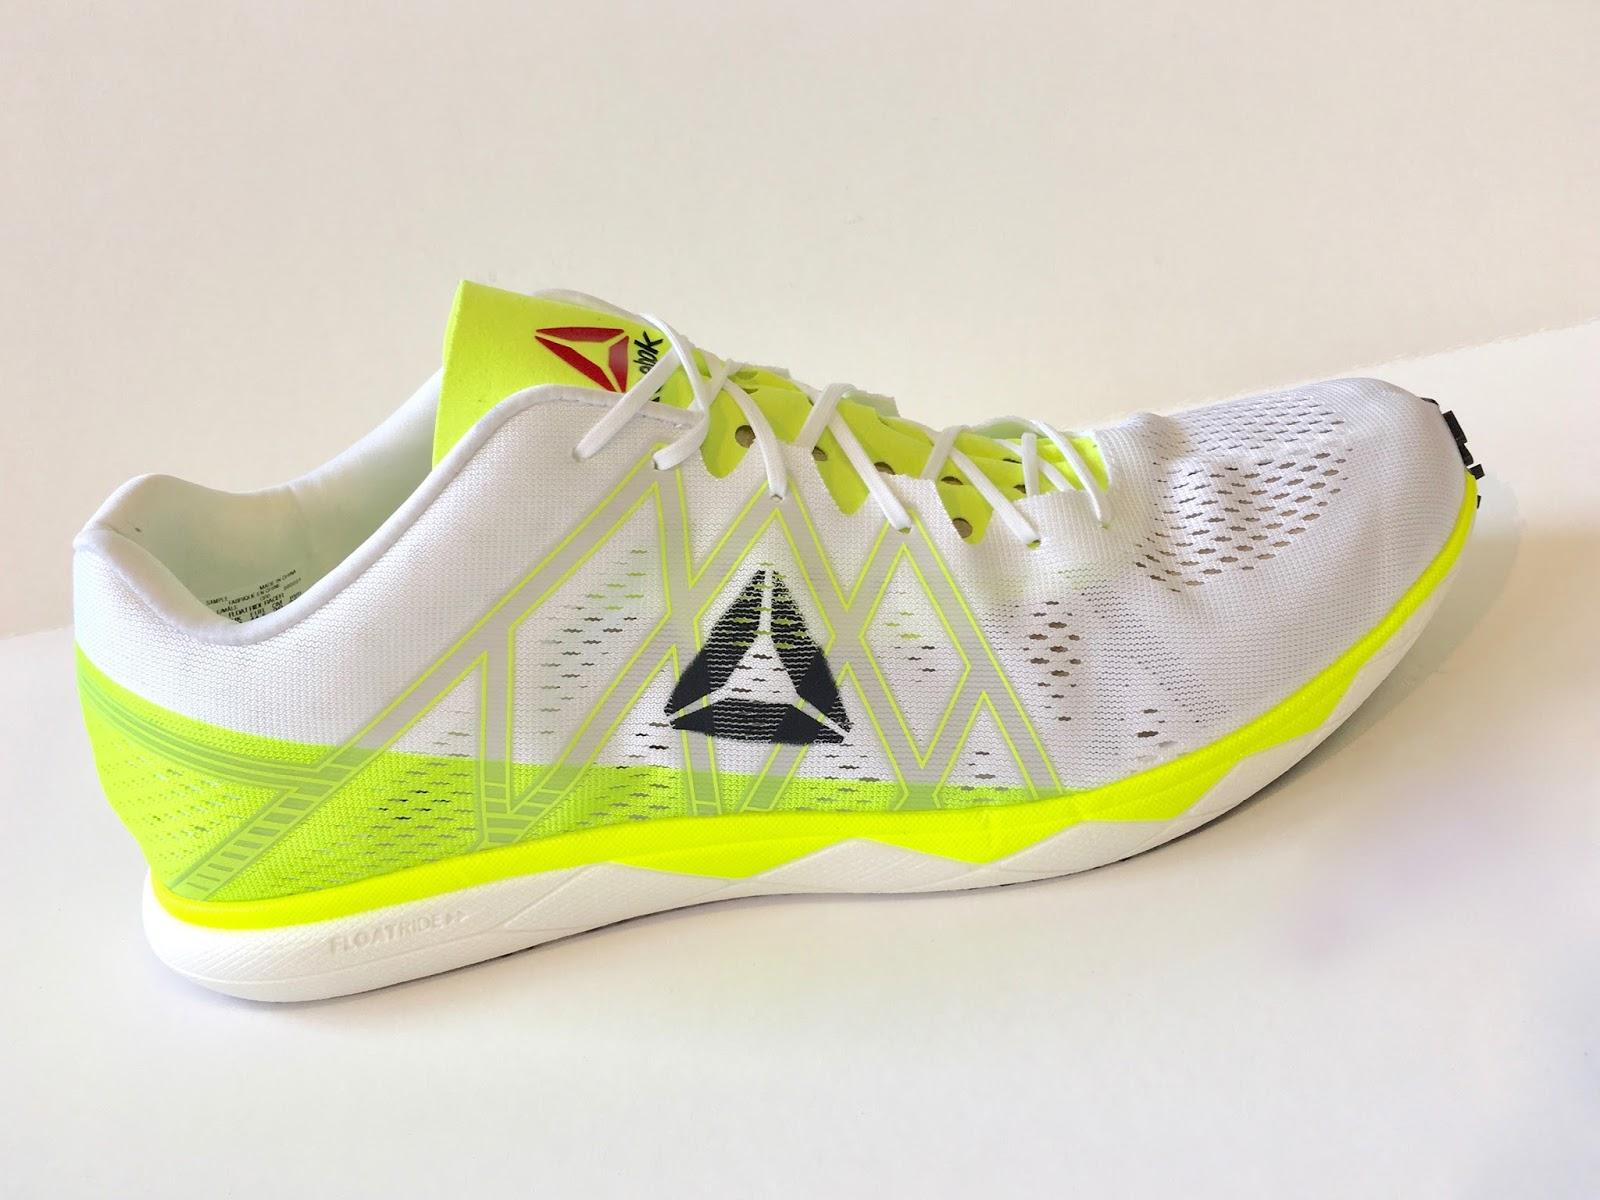 Reebok – Floatride Racer | The Running Shoe Guru